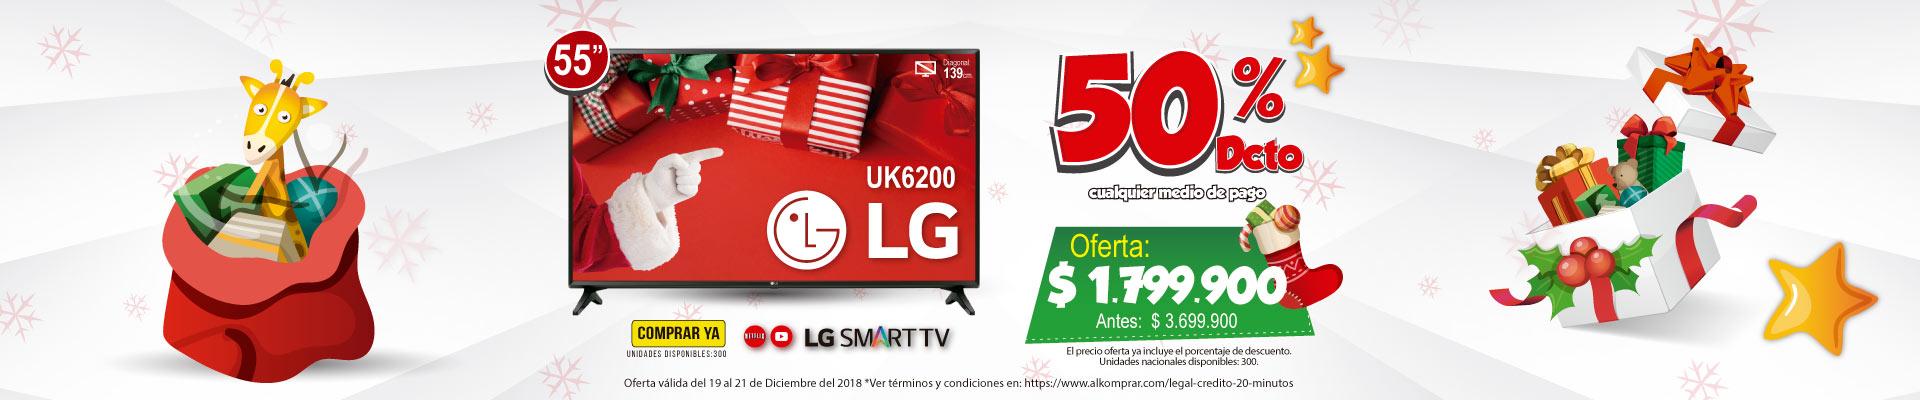 BP ALKP   TV 55